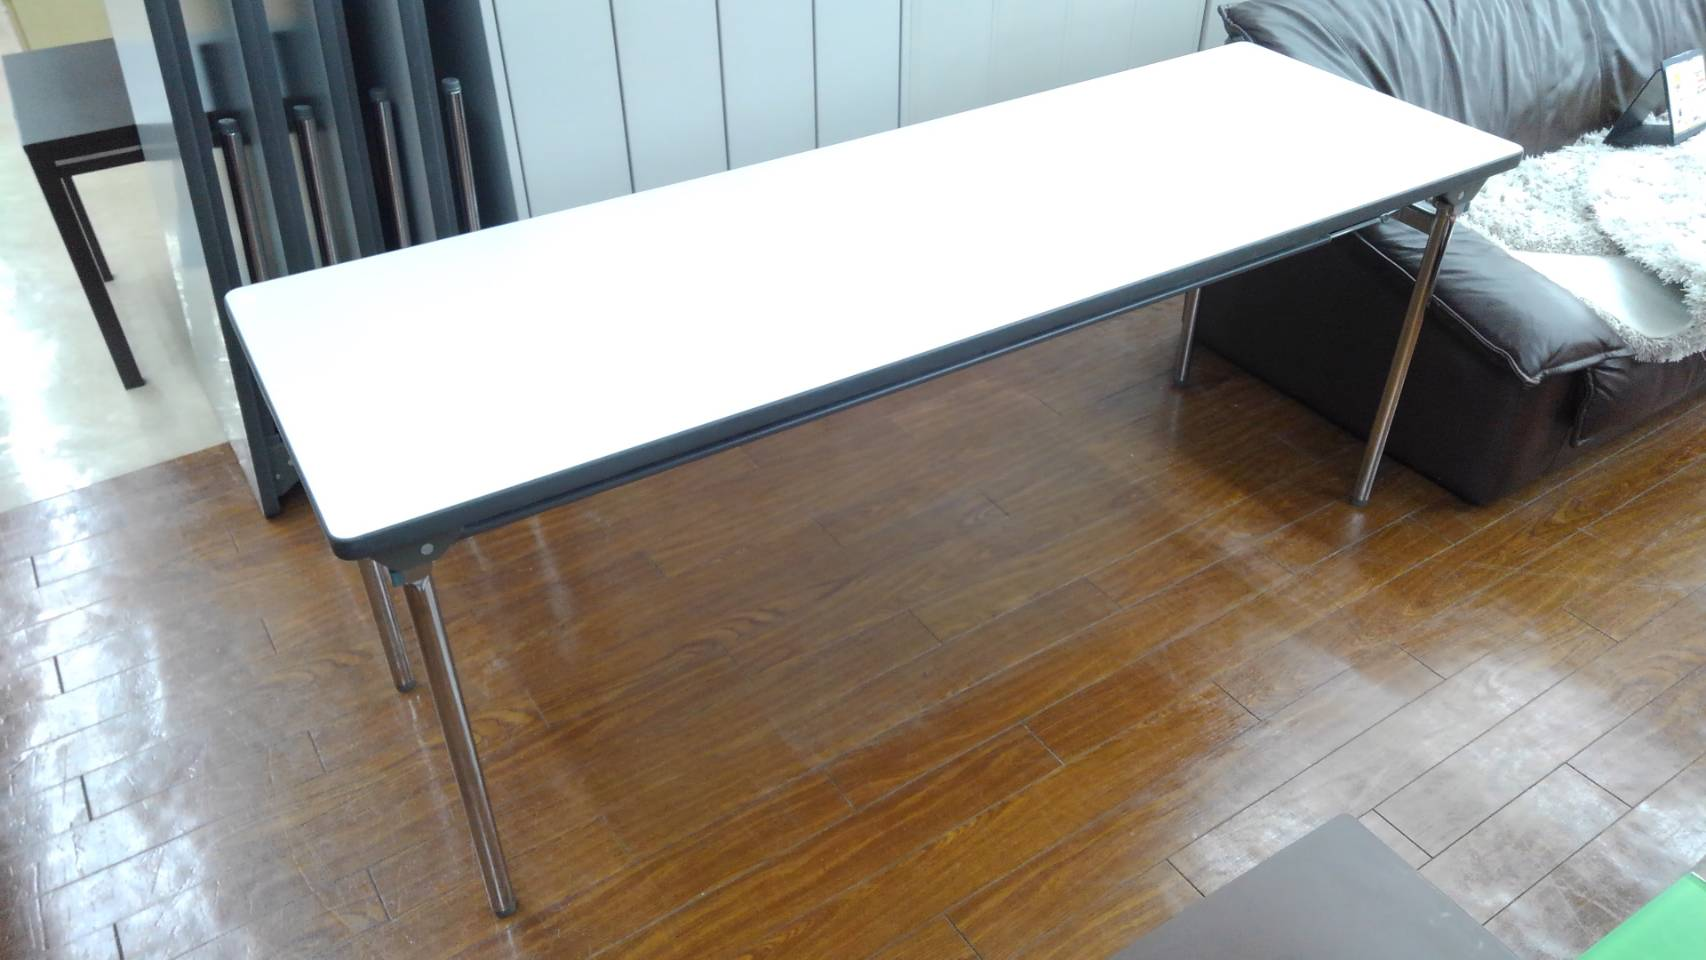 【KOKUYO コクヨ KT-ES501F1 長机 会議用テーブル 折り畳み】買い取り致しました!の買取-